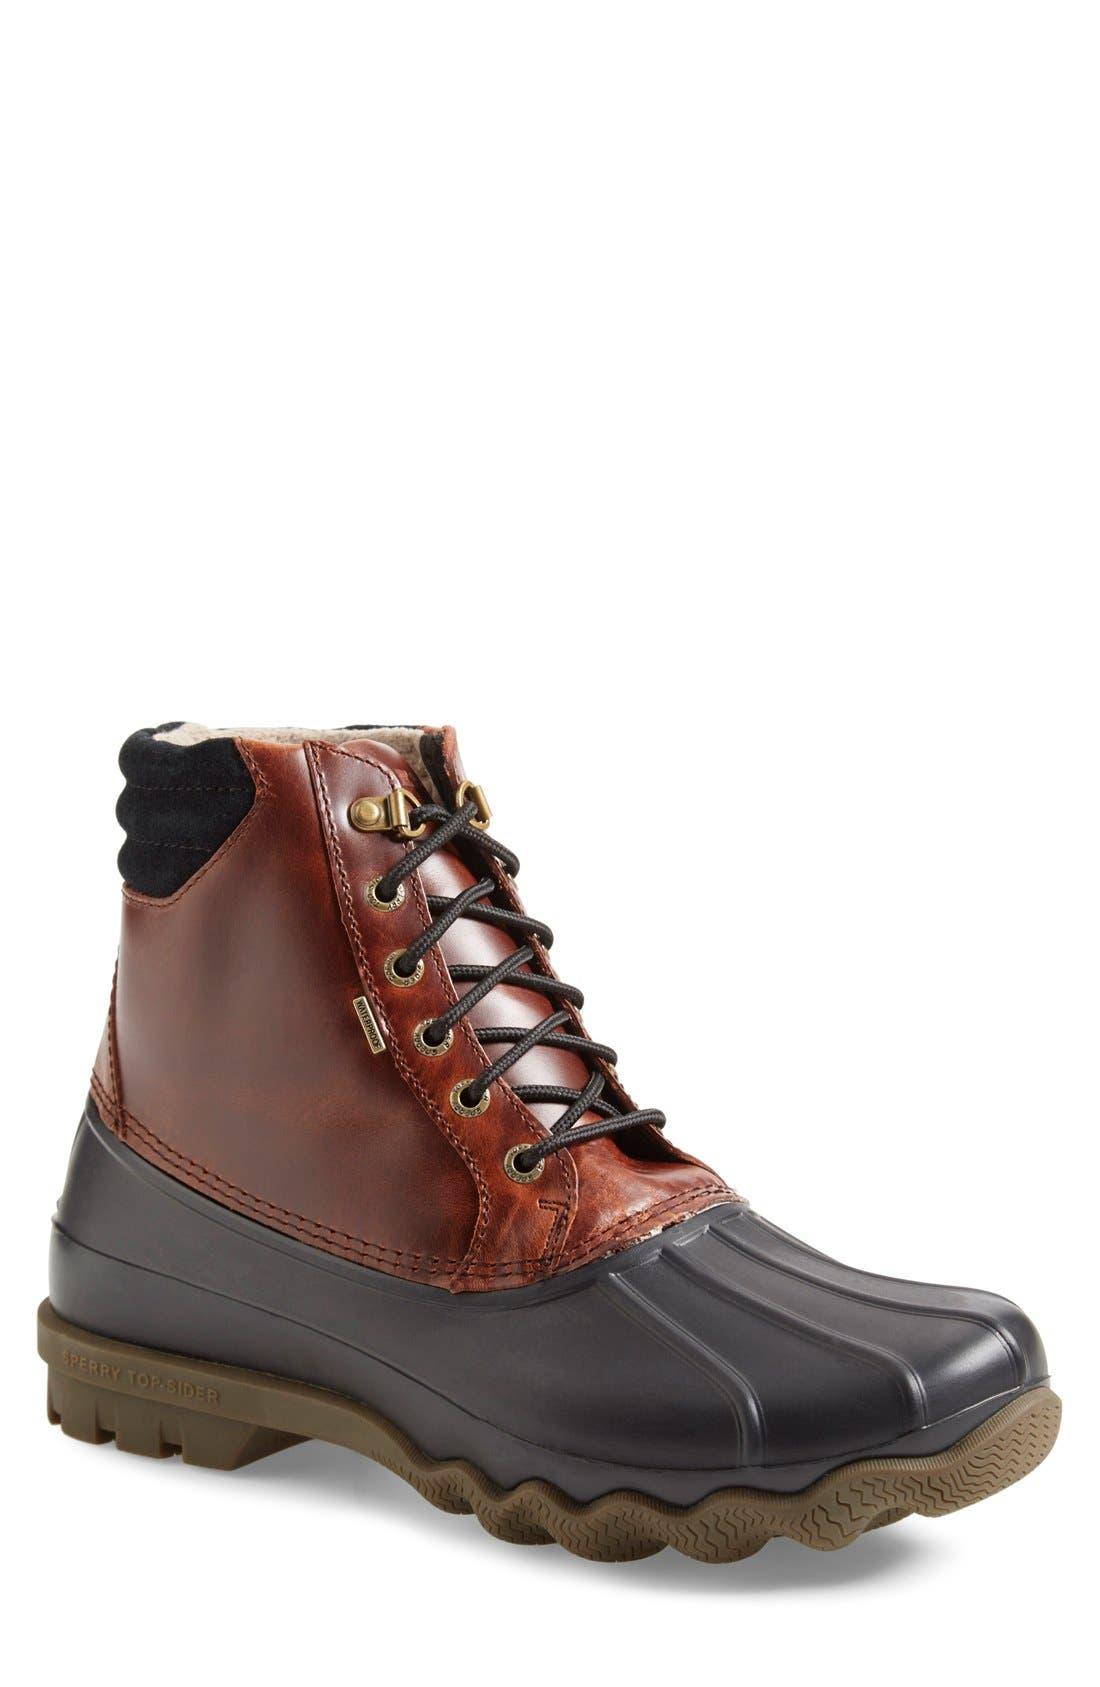 Main Image - Sperry Top-Sider® 'Avenue' Rain Boot (Men)